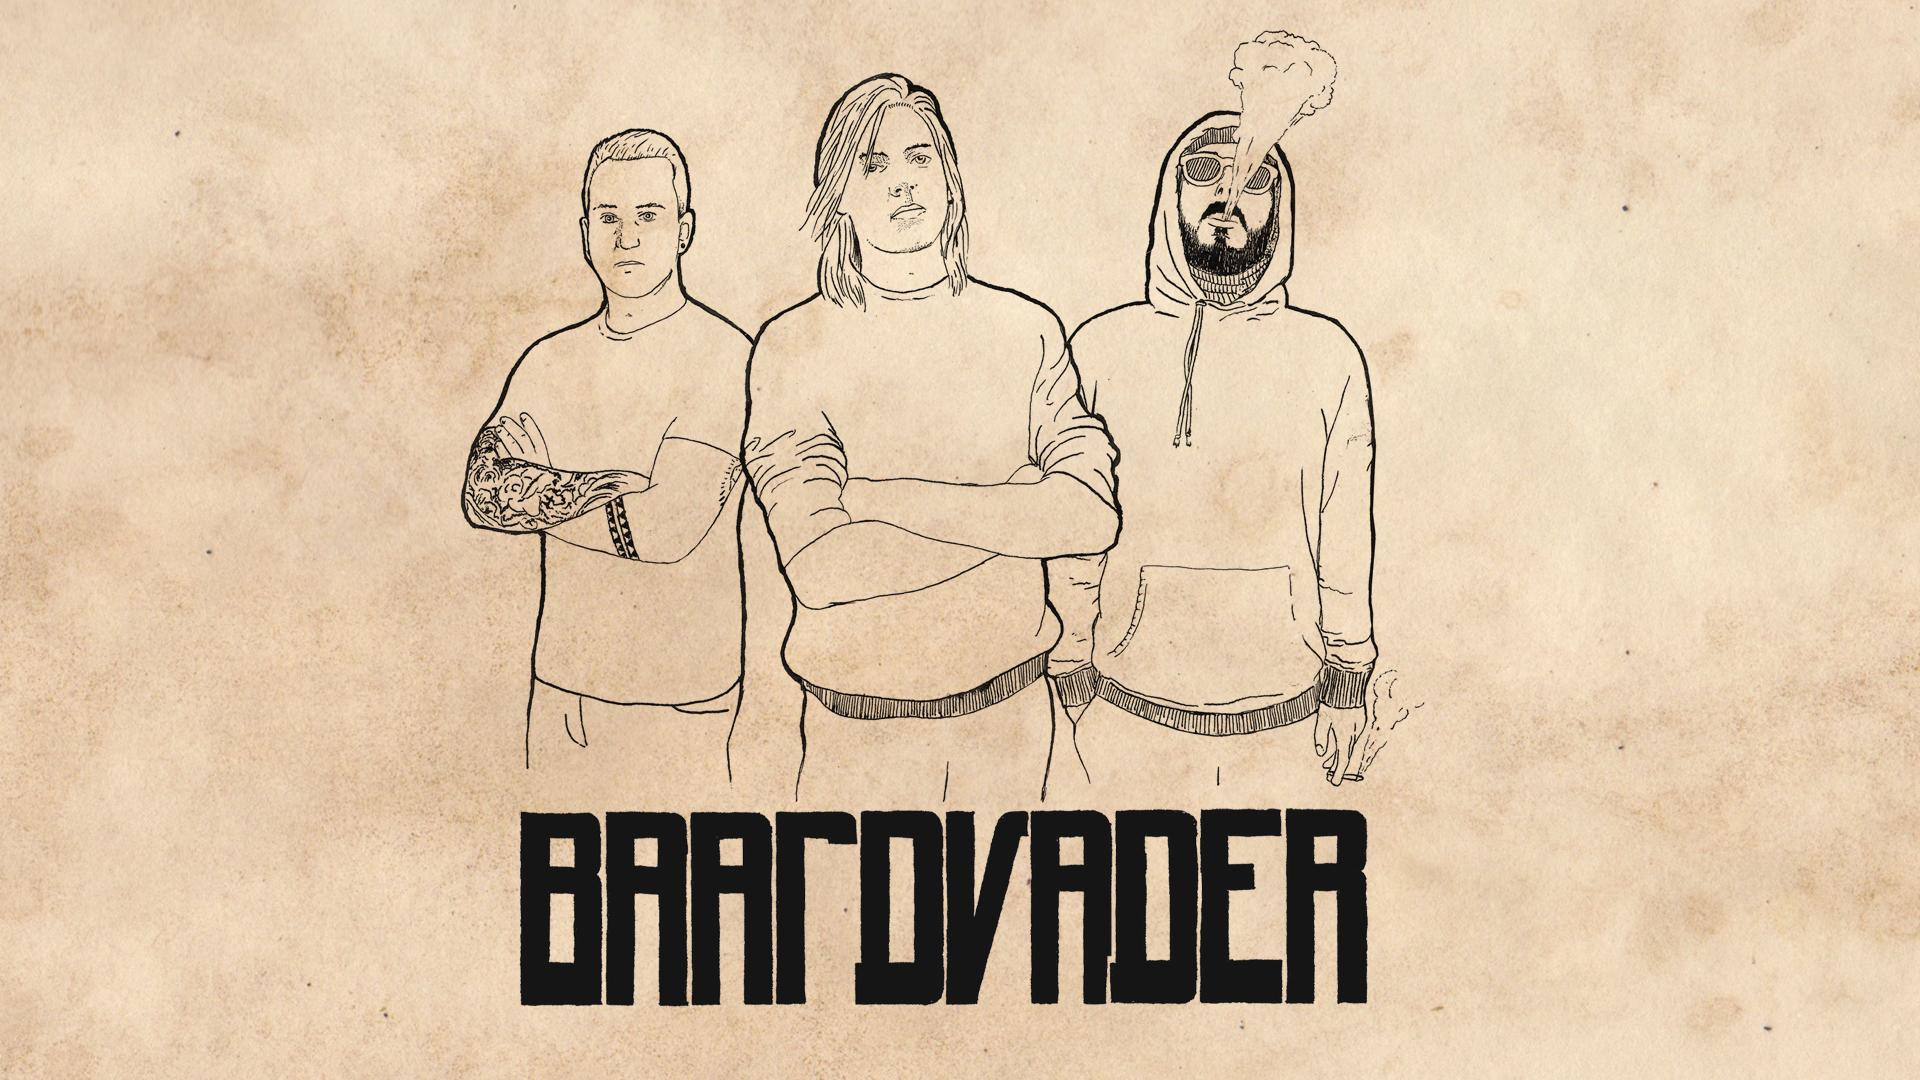 Baardvader